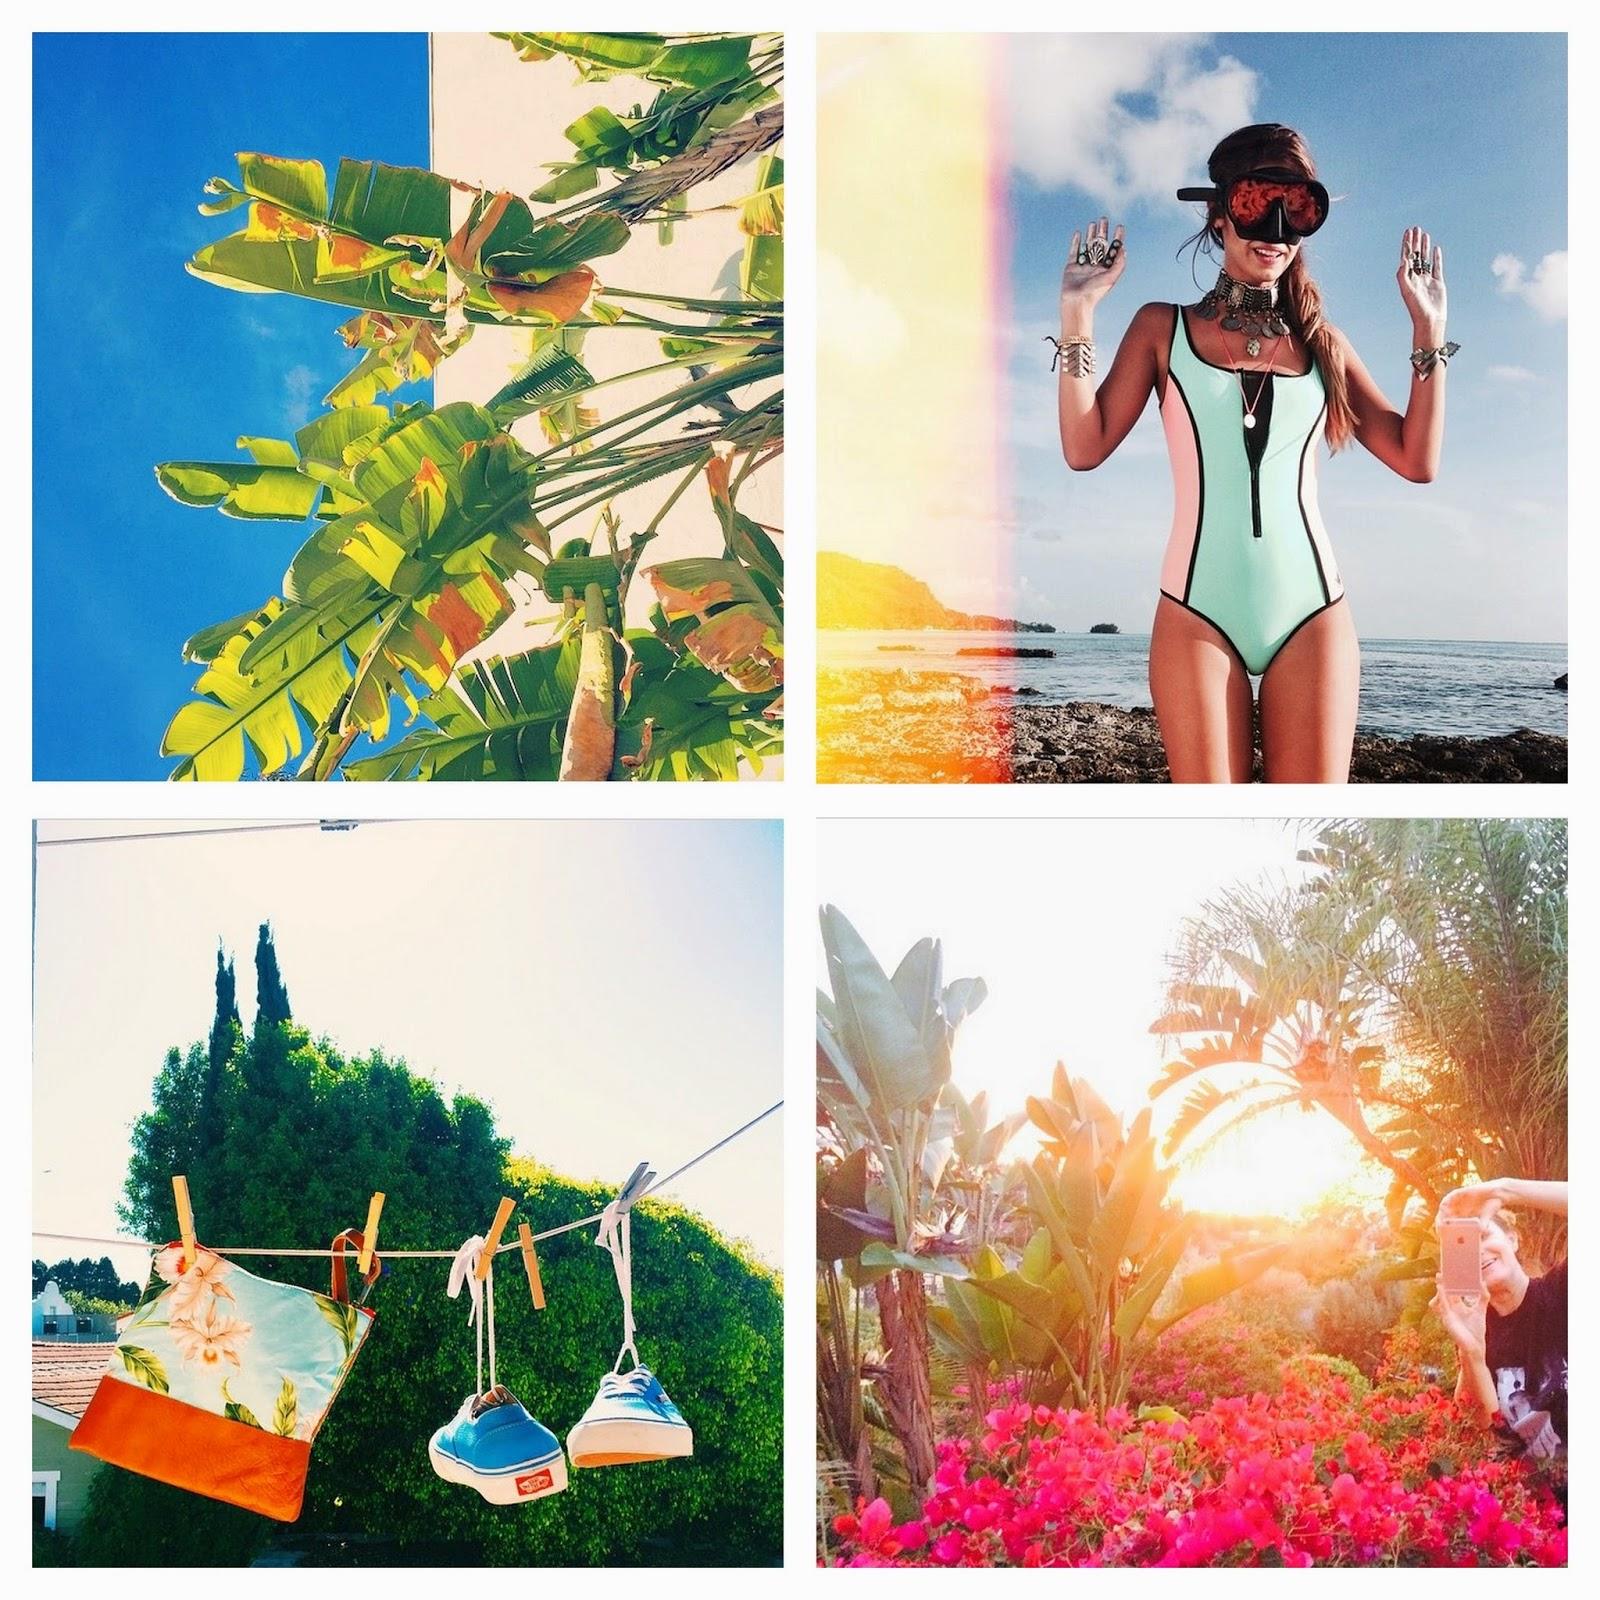 instalove,instagram,moldboard,the mood,hello sun